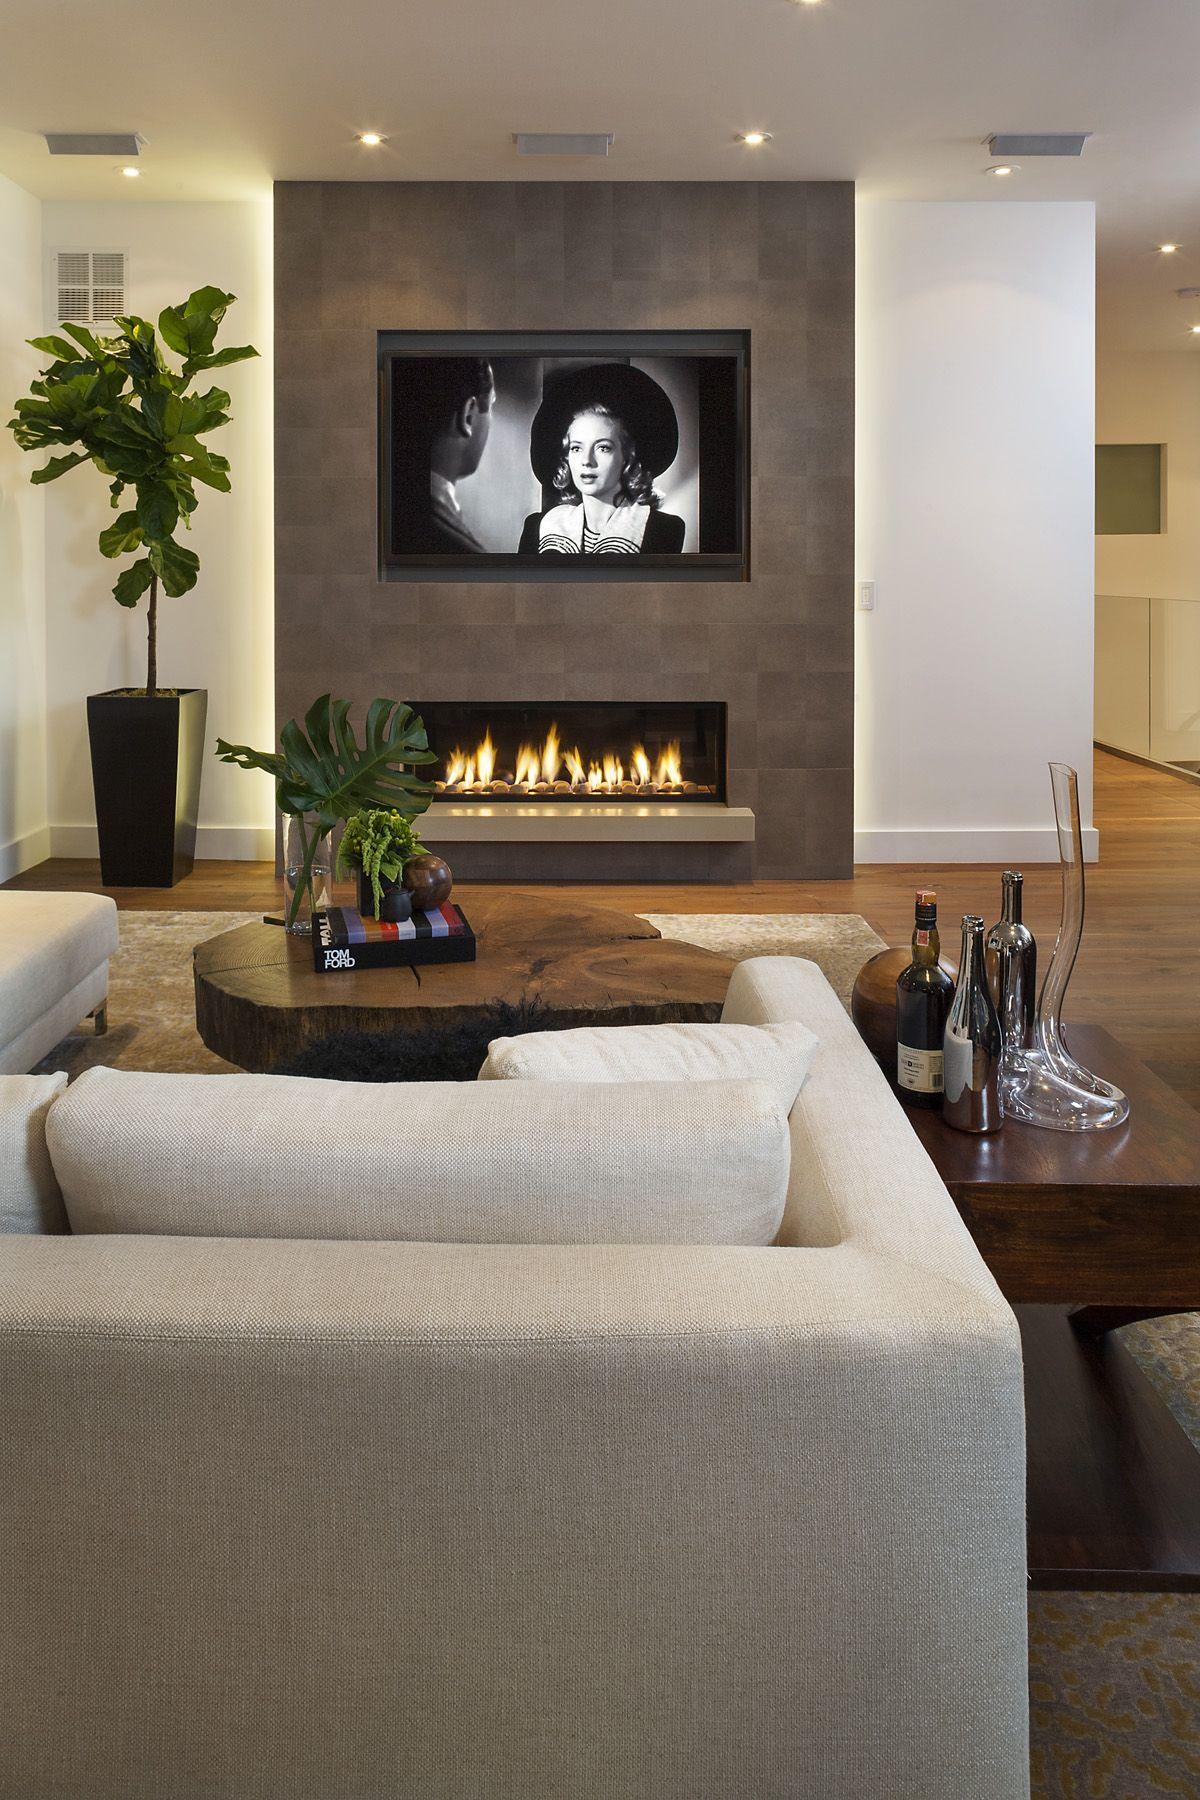 Modern Living Room Fireplace Home Fireplace Home Living Room Living Room With Fireplace